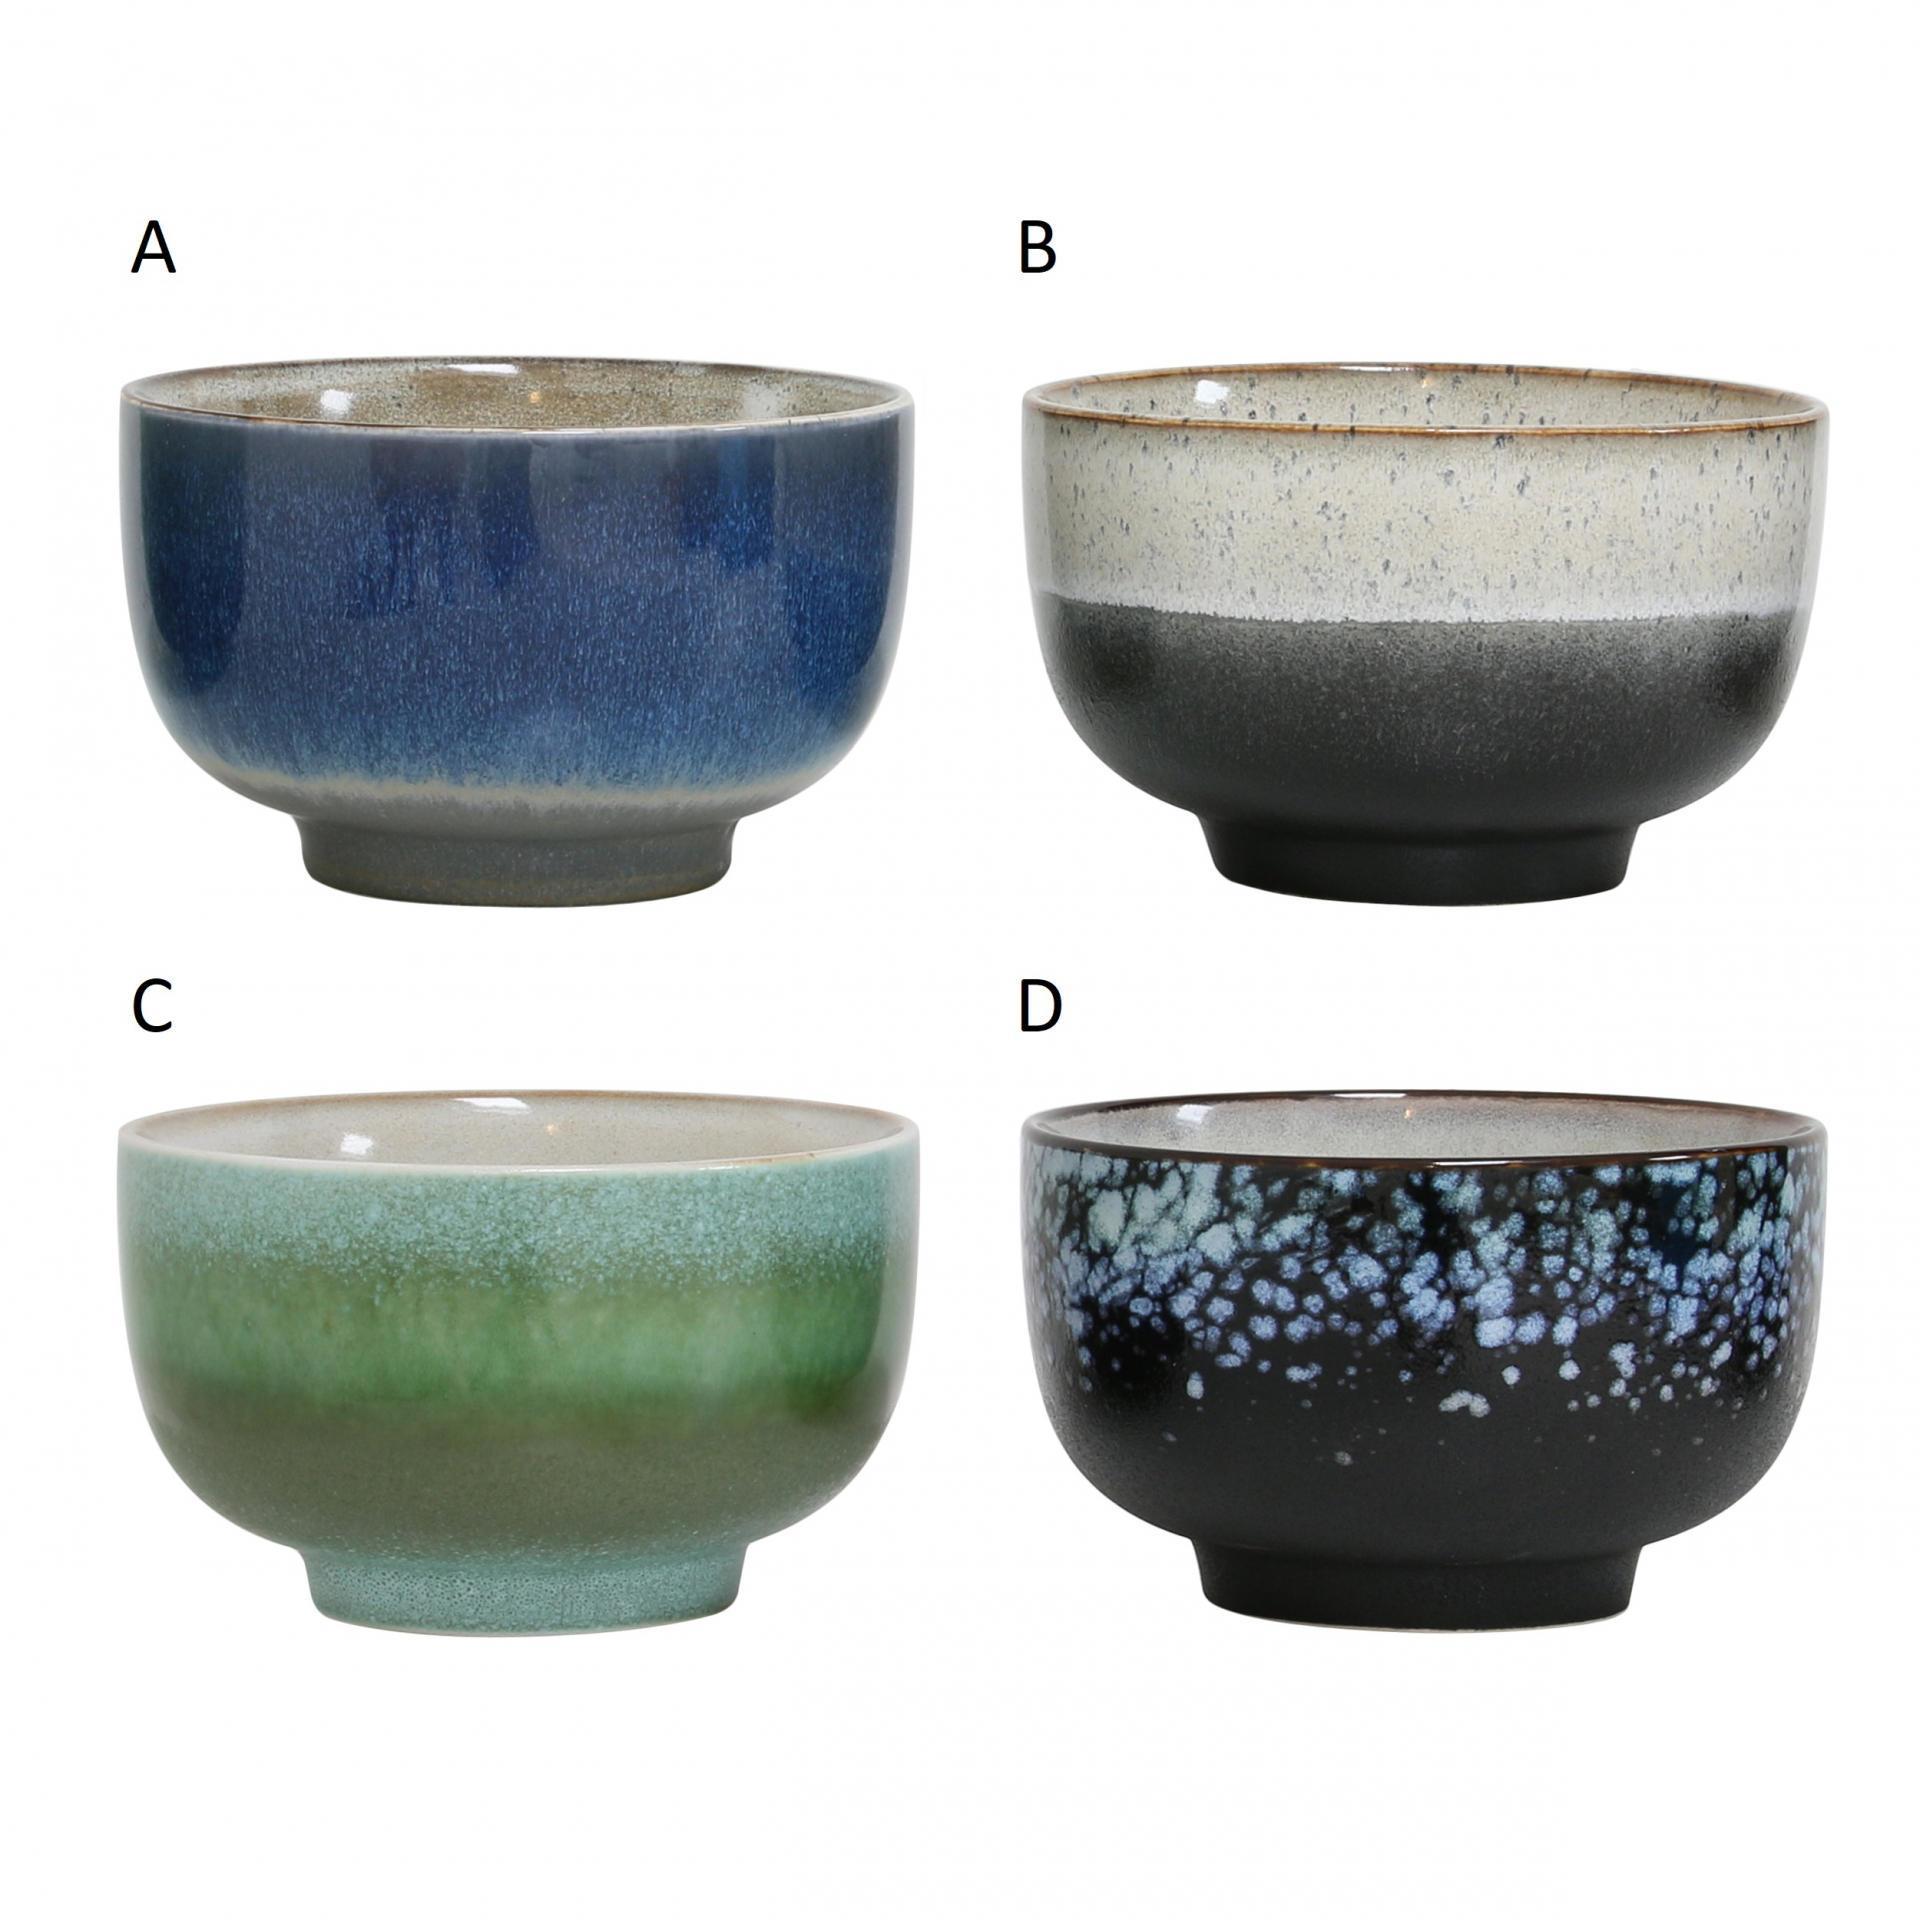 HK living Keramická miska 70´s Typ A, modrá barva, zelená barva, hnědá barva, keramika